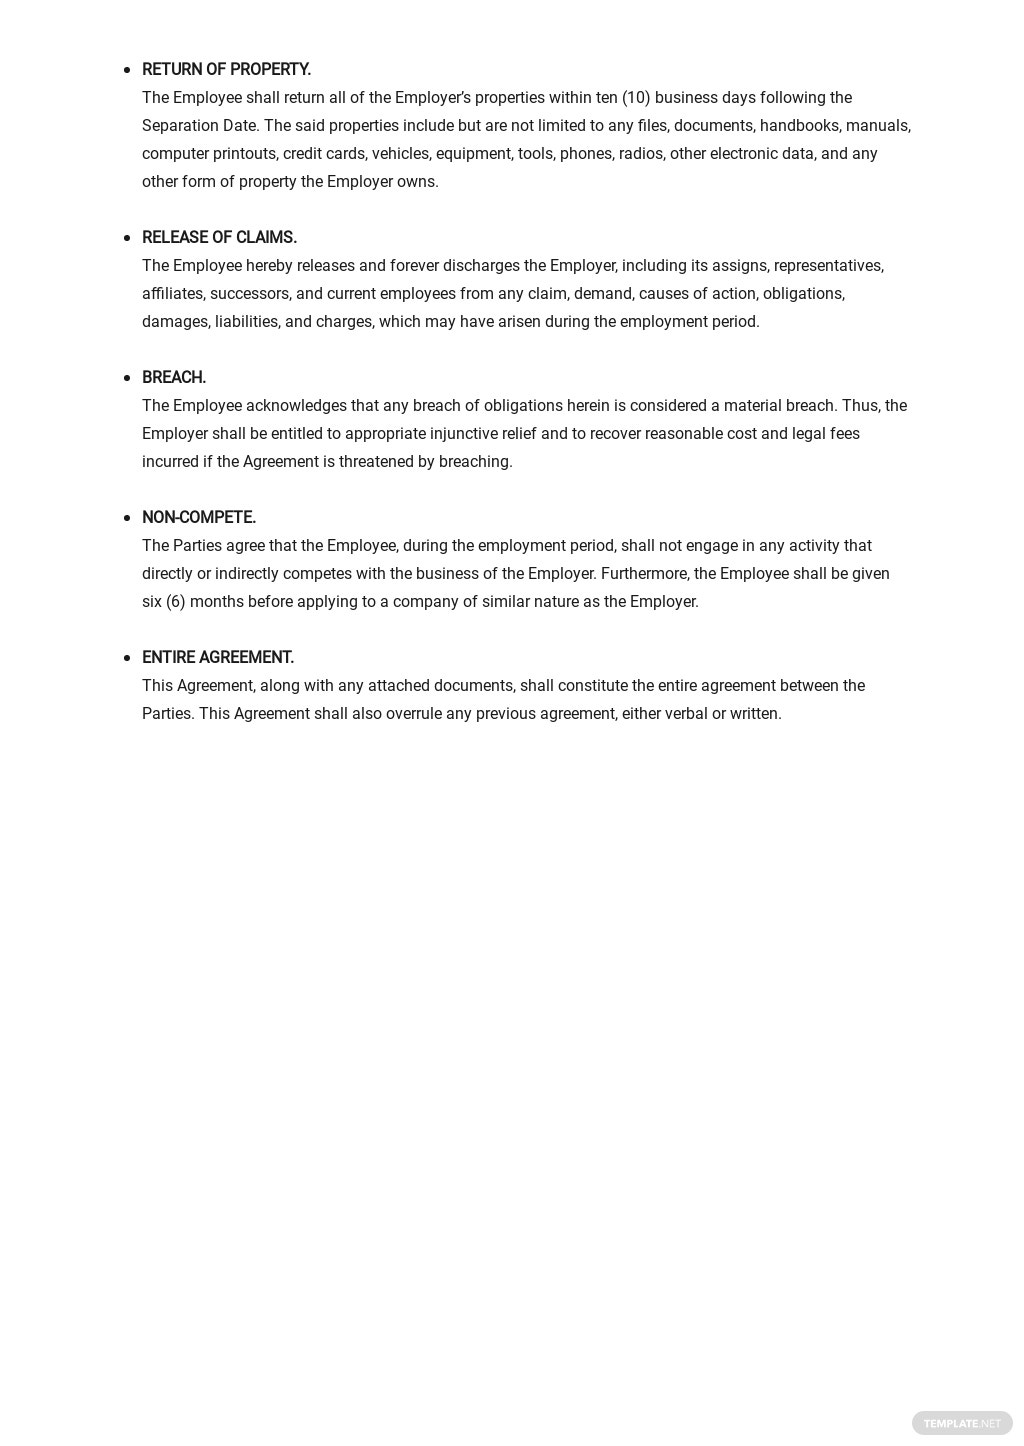 Employment Separation Agreement Template 2.jpe